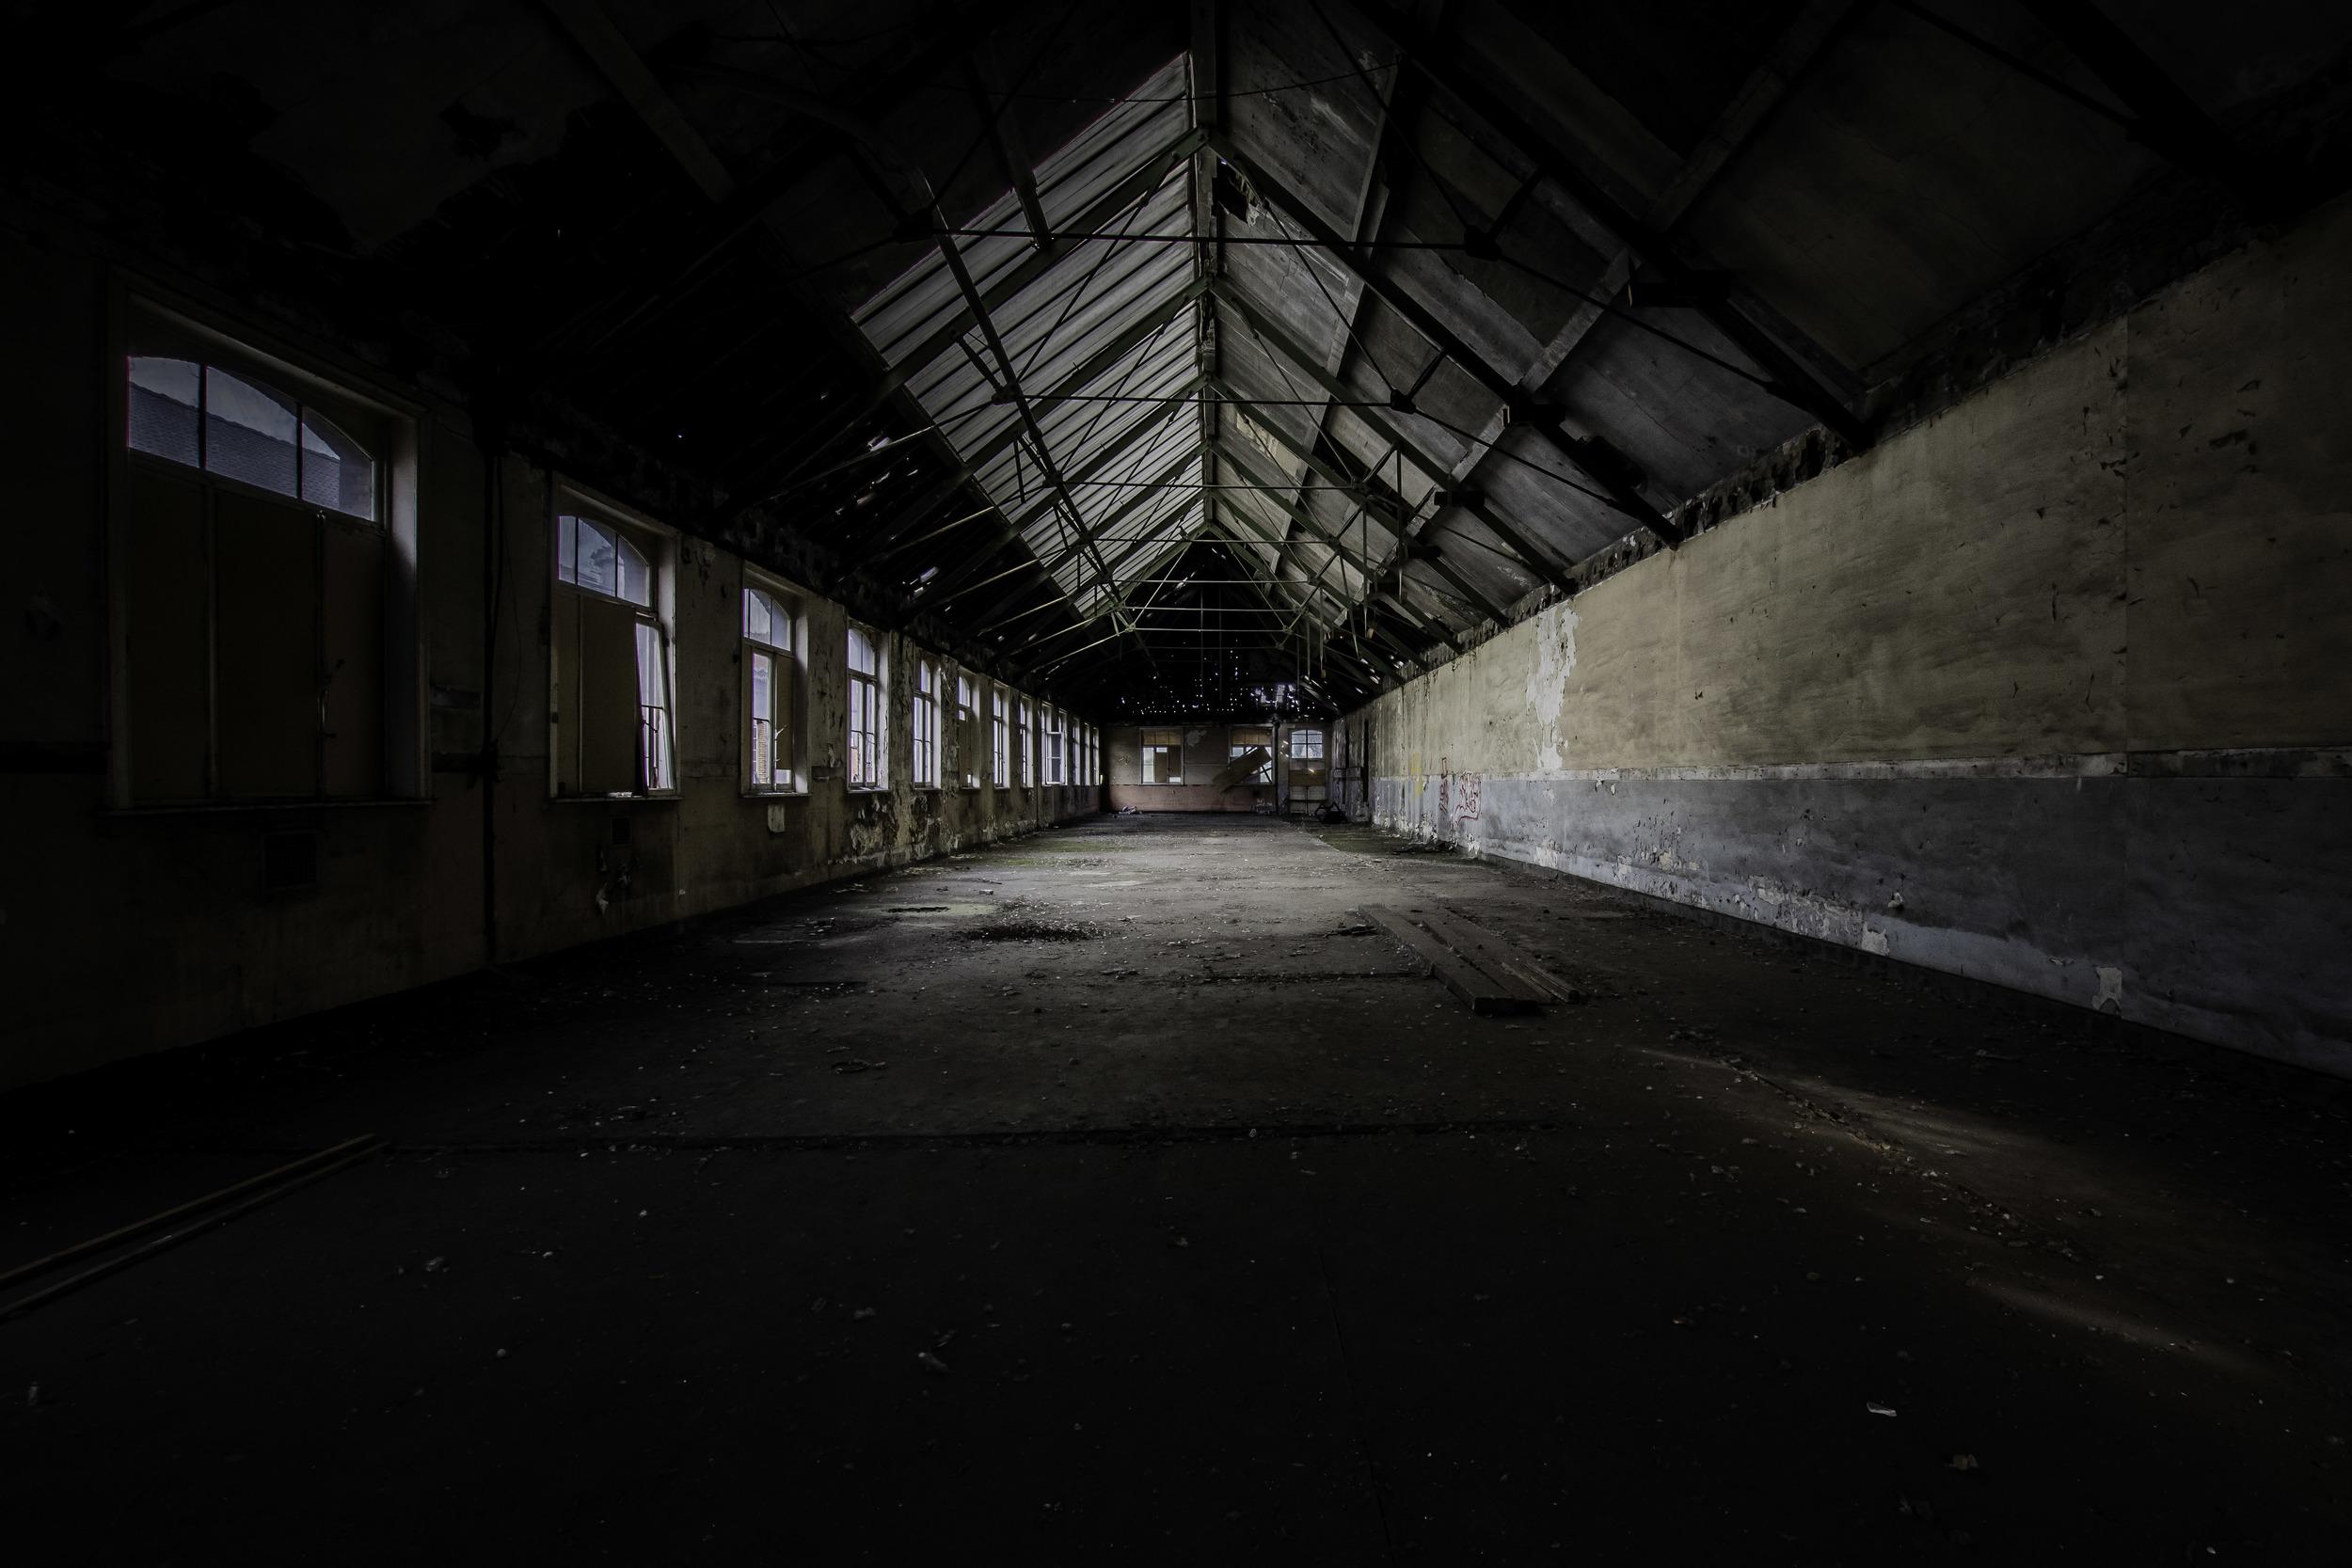 viewfinder-eigenzinnige-fotografie-urbex-vergane-glorie-oude-papierfabriek-seminariezaal-links